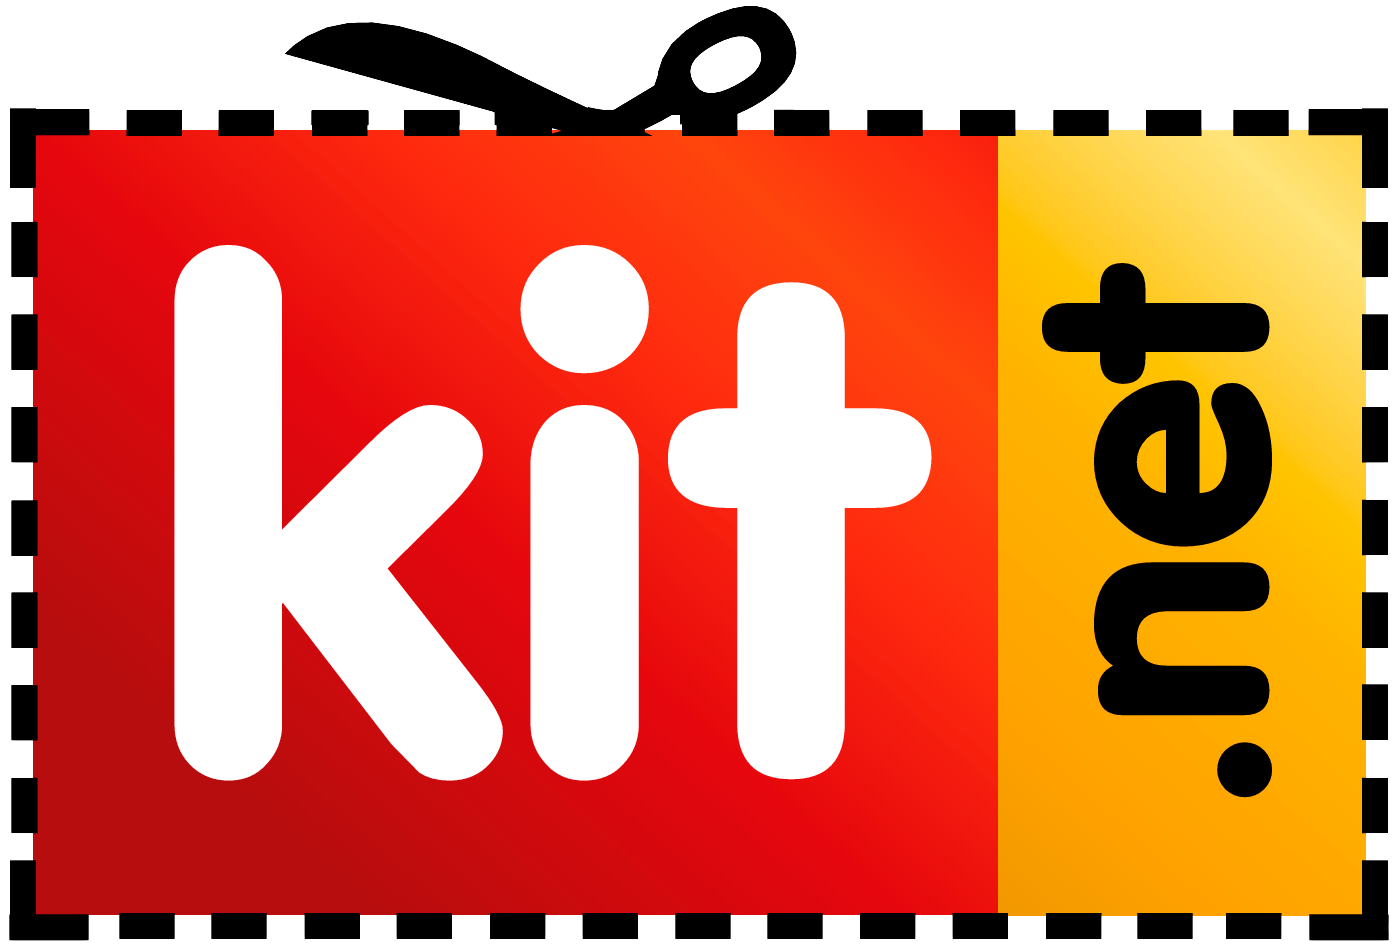 Kit.net